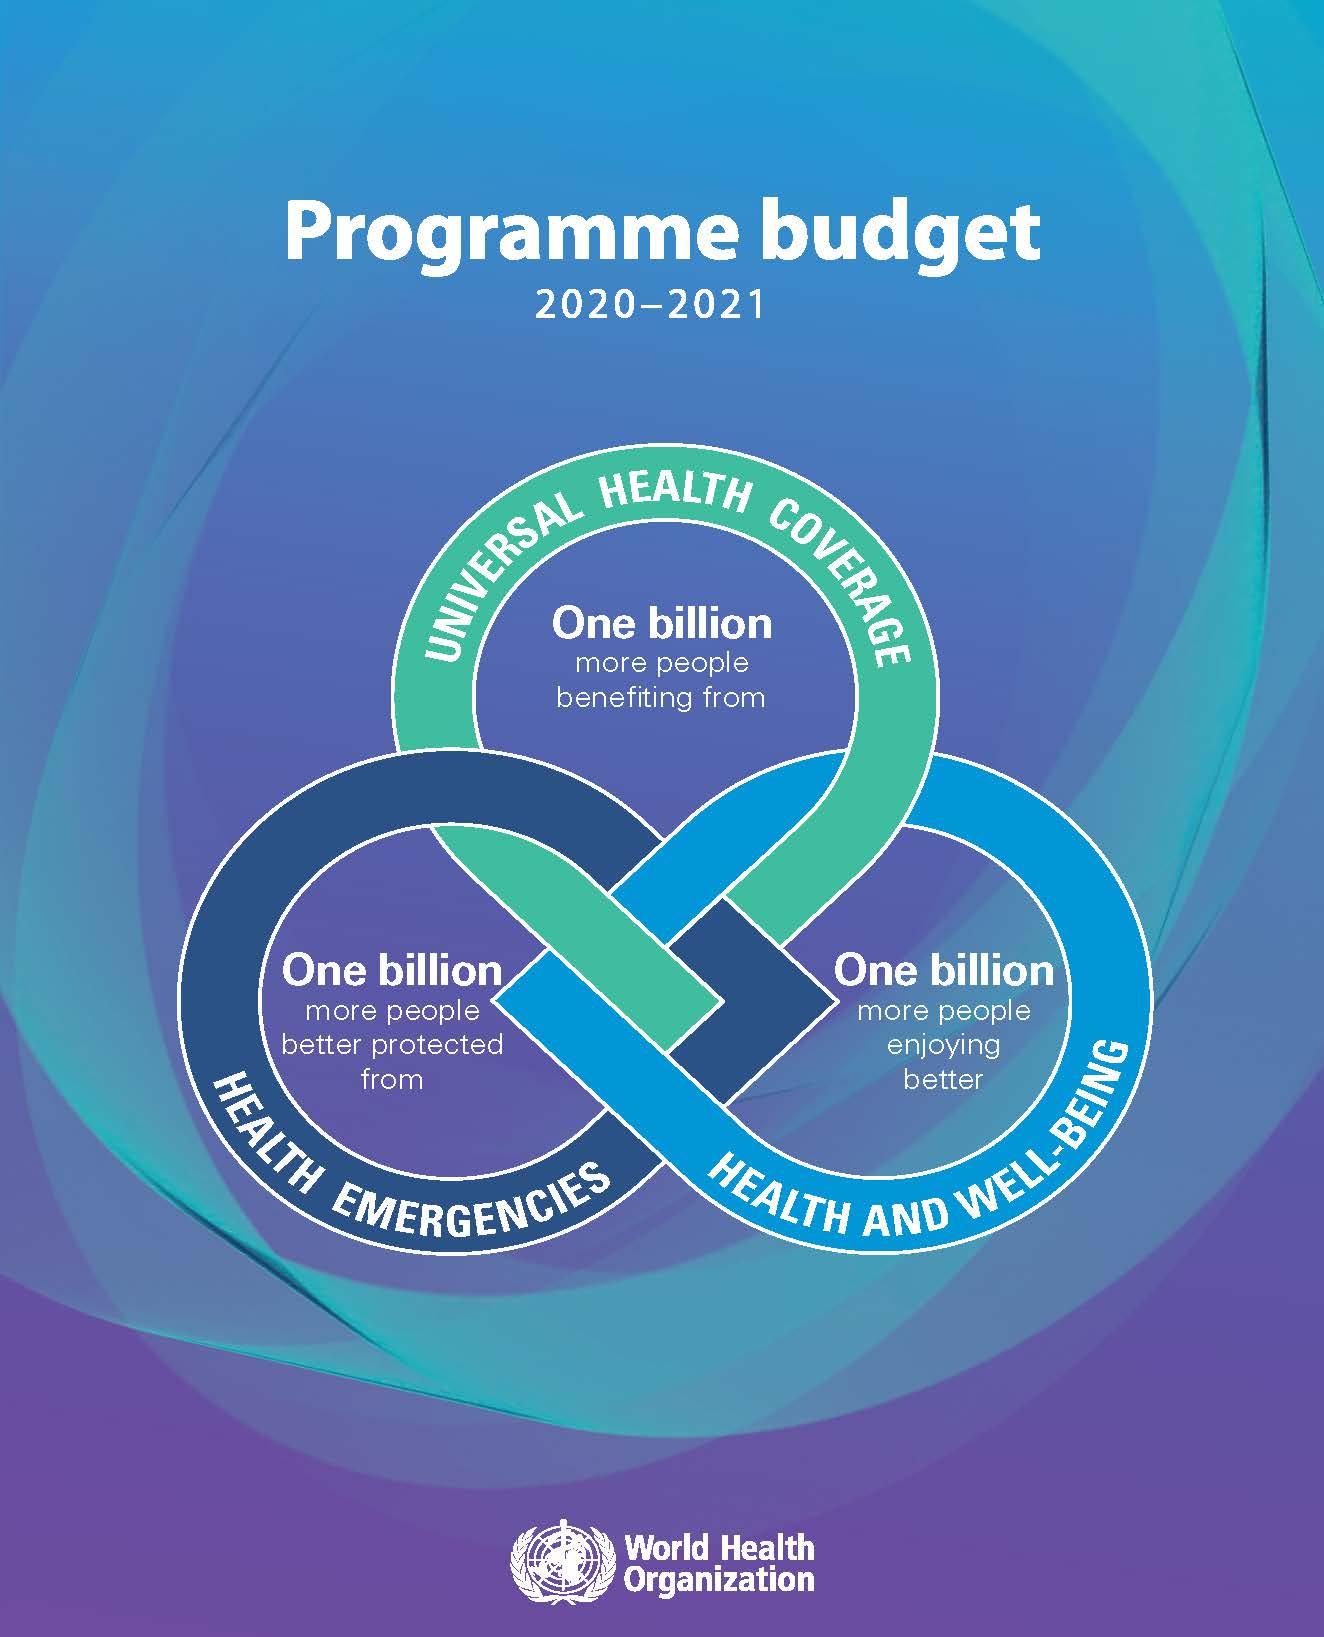 Programme budget 2020-2021